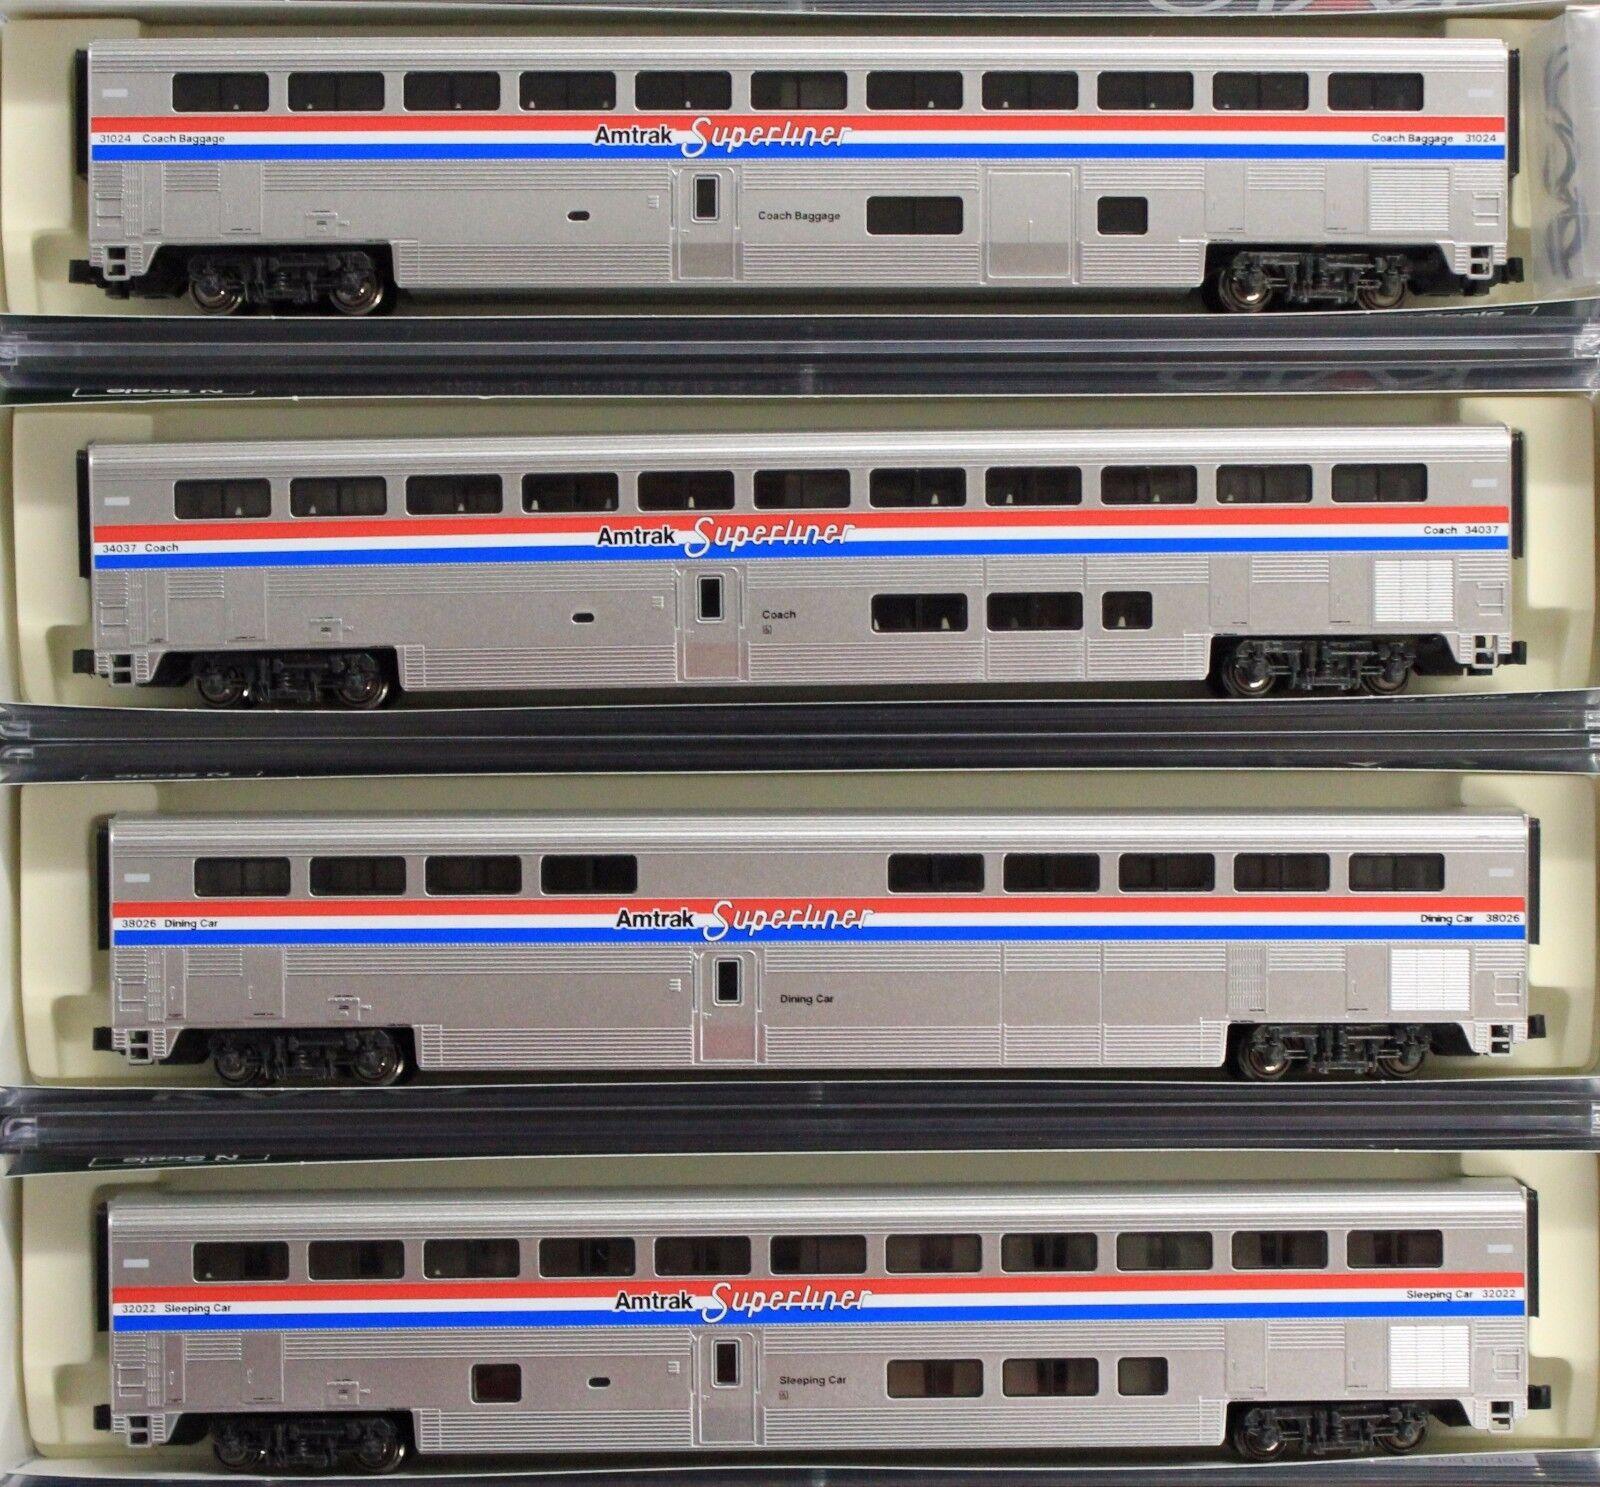 Escala N-Kato 106-3517 Amtrak súperliner fase III 4-Coche Set A-difícil de encontrar